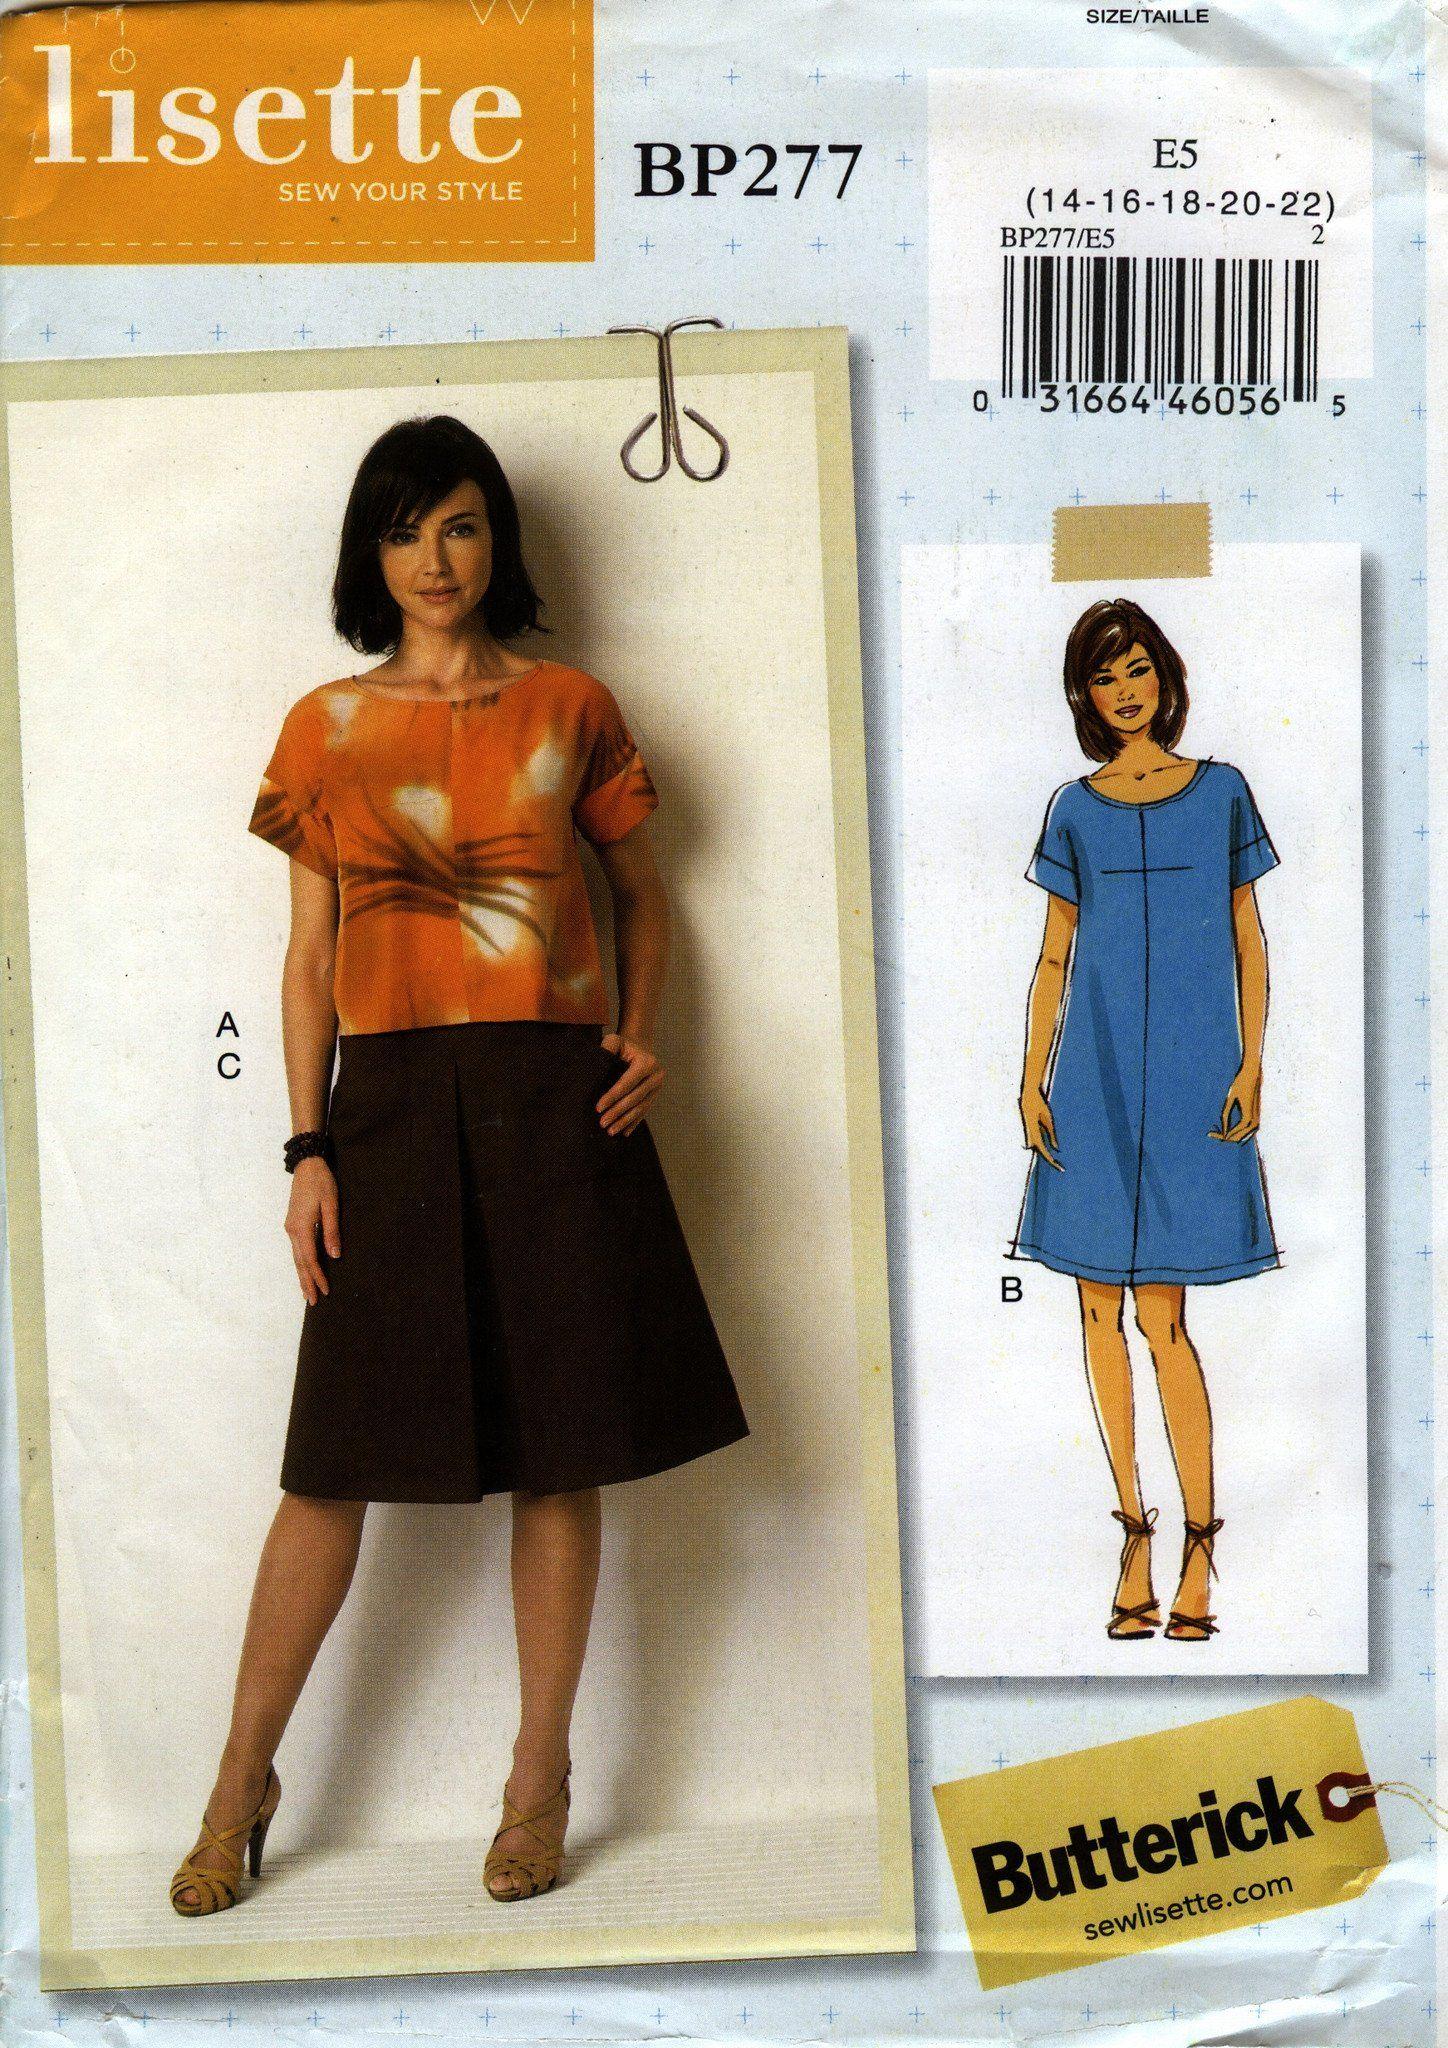 Butterick B6526 Lisette PATTERN Misses Top /& Pants Sizes 6-22 New